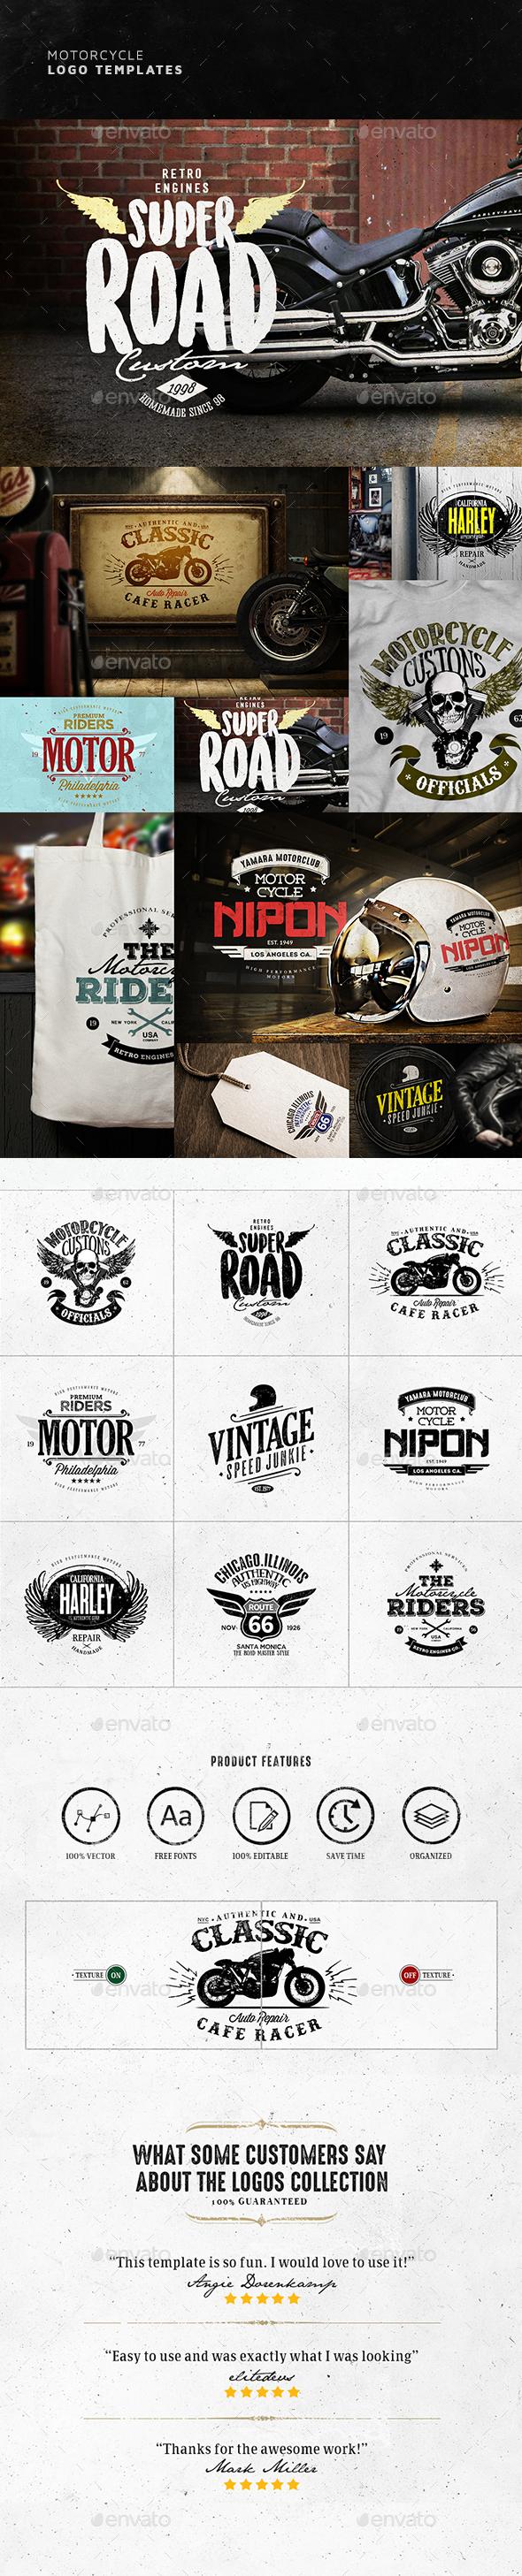 Vintage Motorcycle Logo Design - Badges & Stickers Web Elements